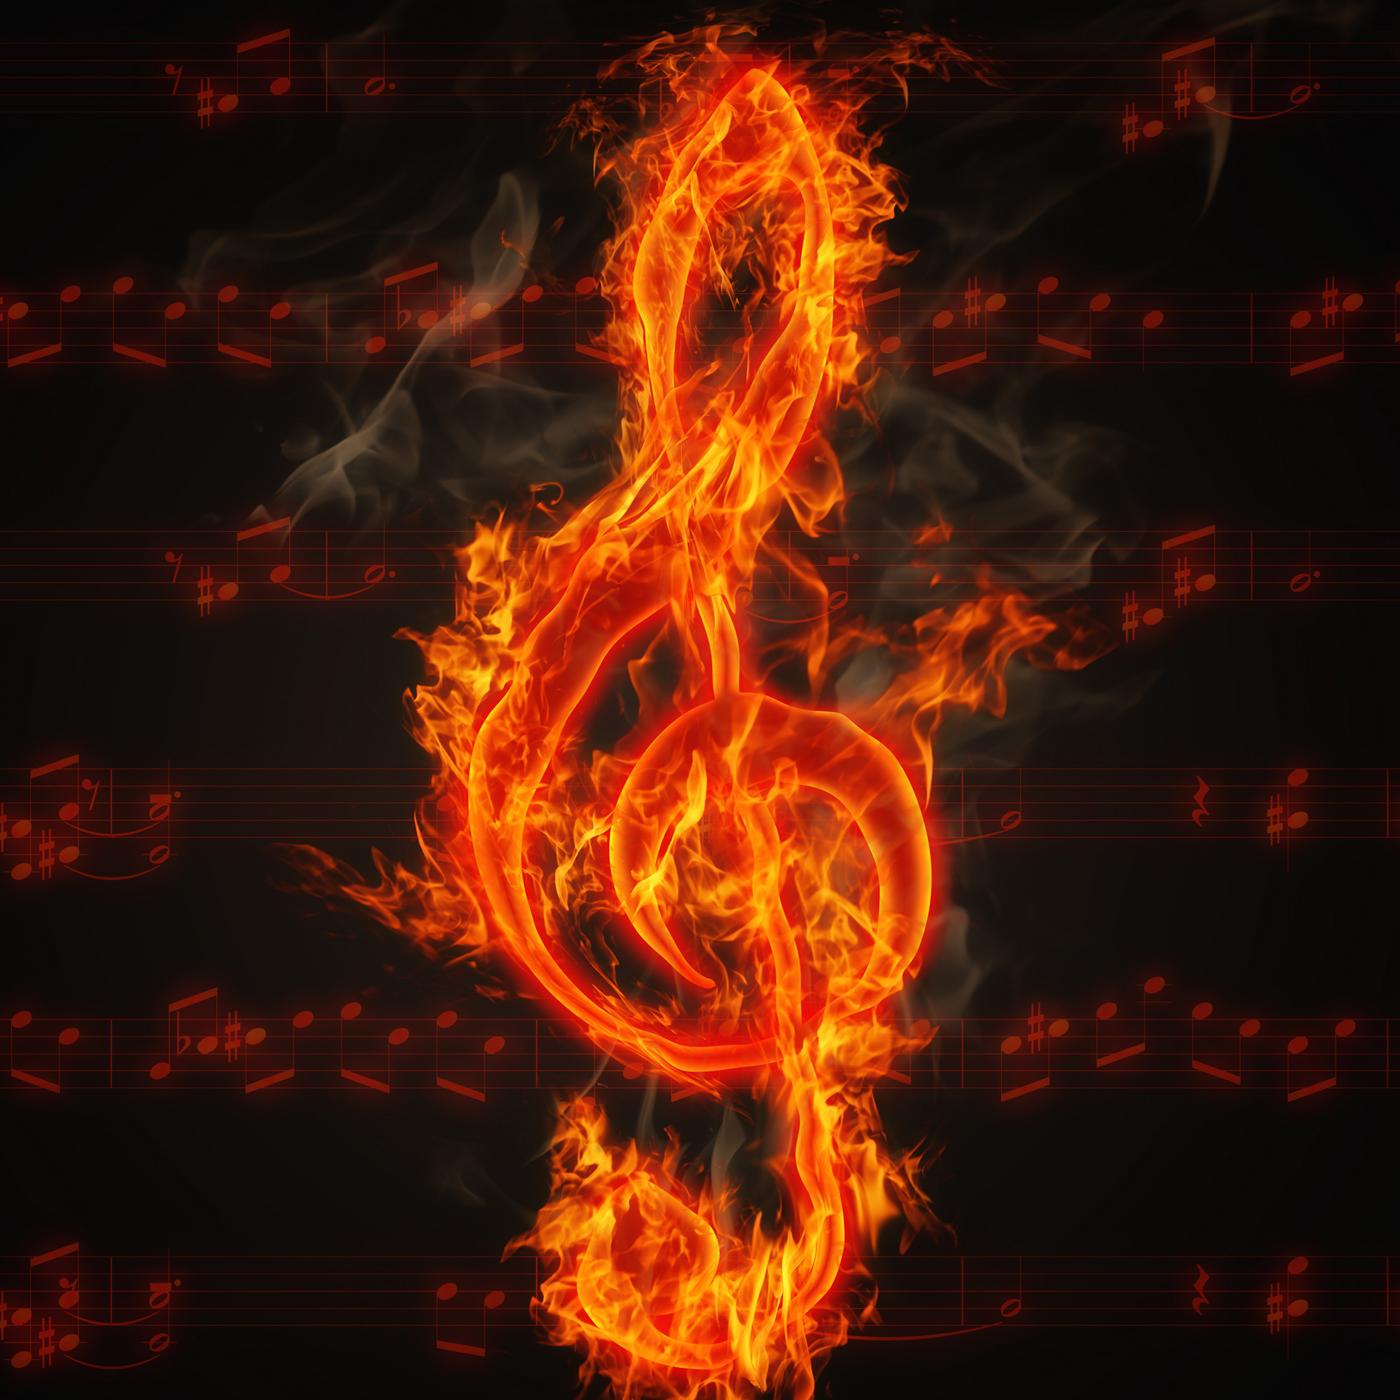 symphonic metal on rockradiocom rockradiocom rock